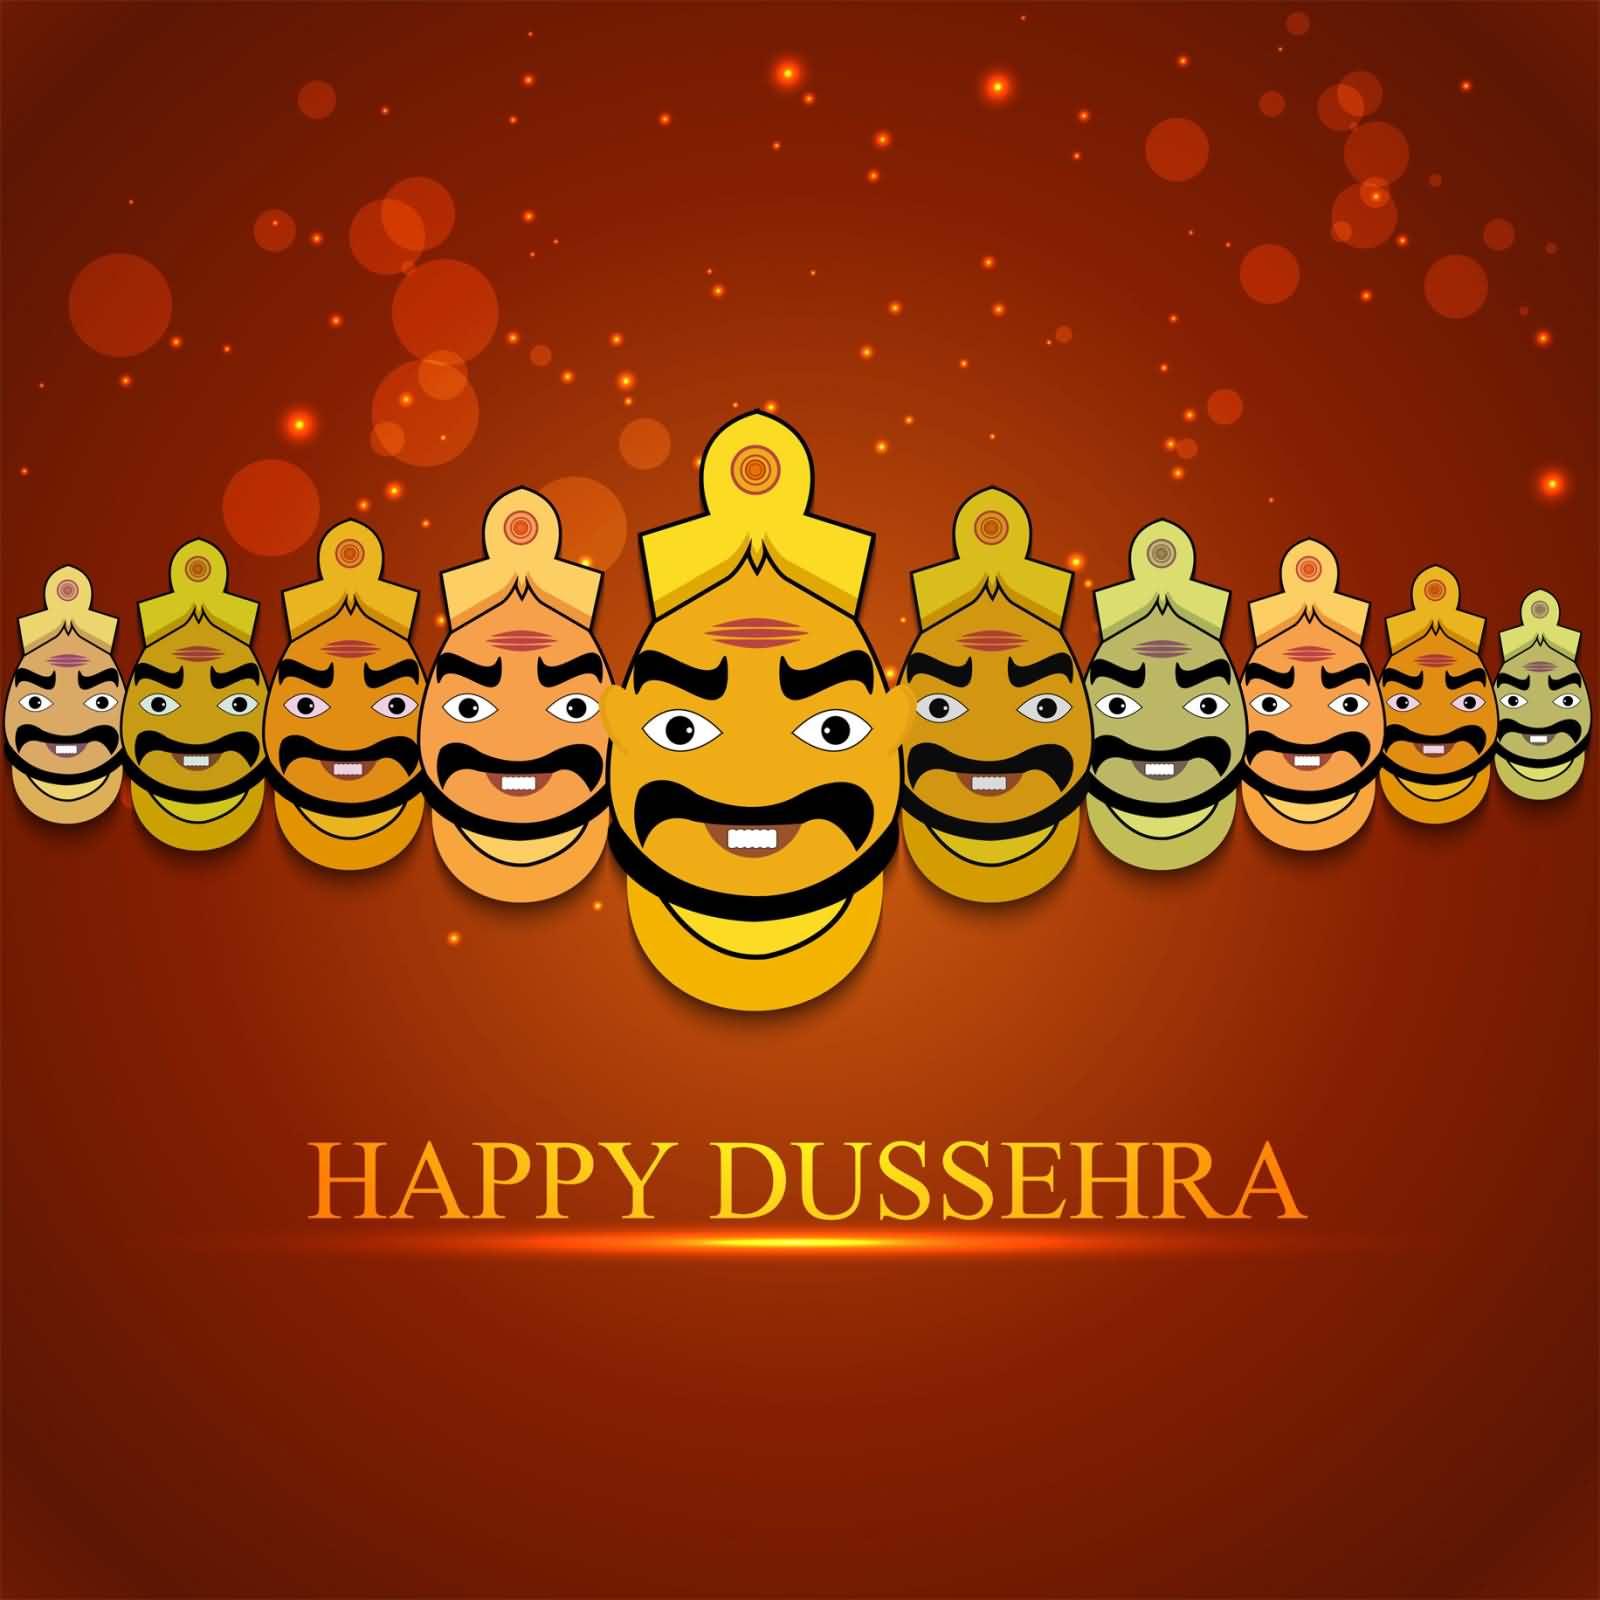 Happy Dussehra Ravana Funny Faces Greeting Card